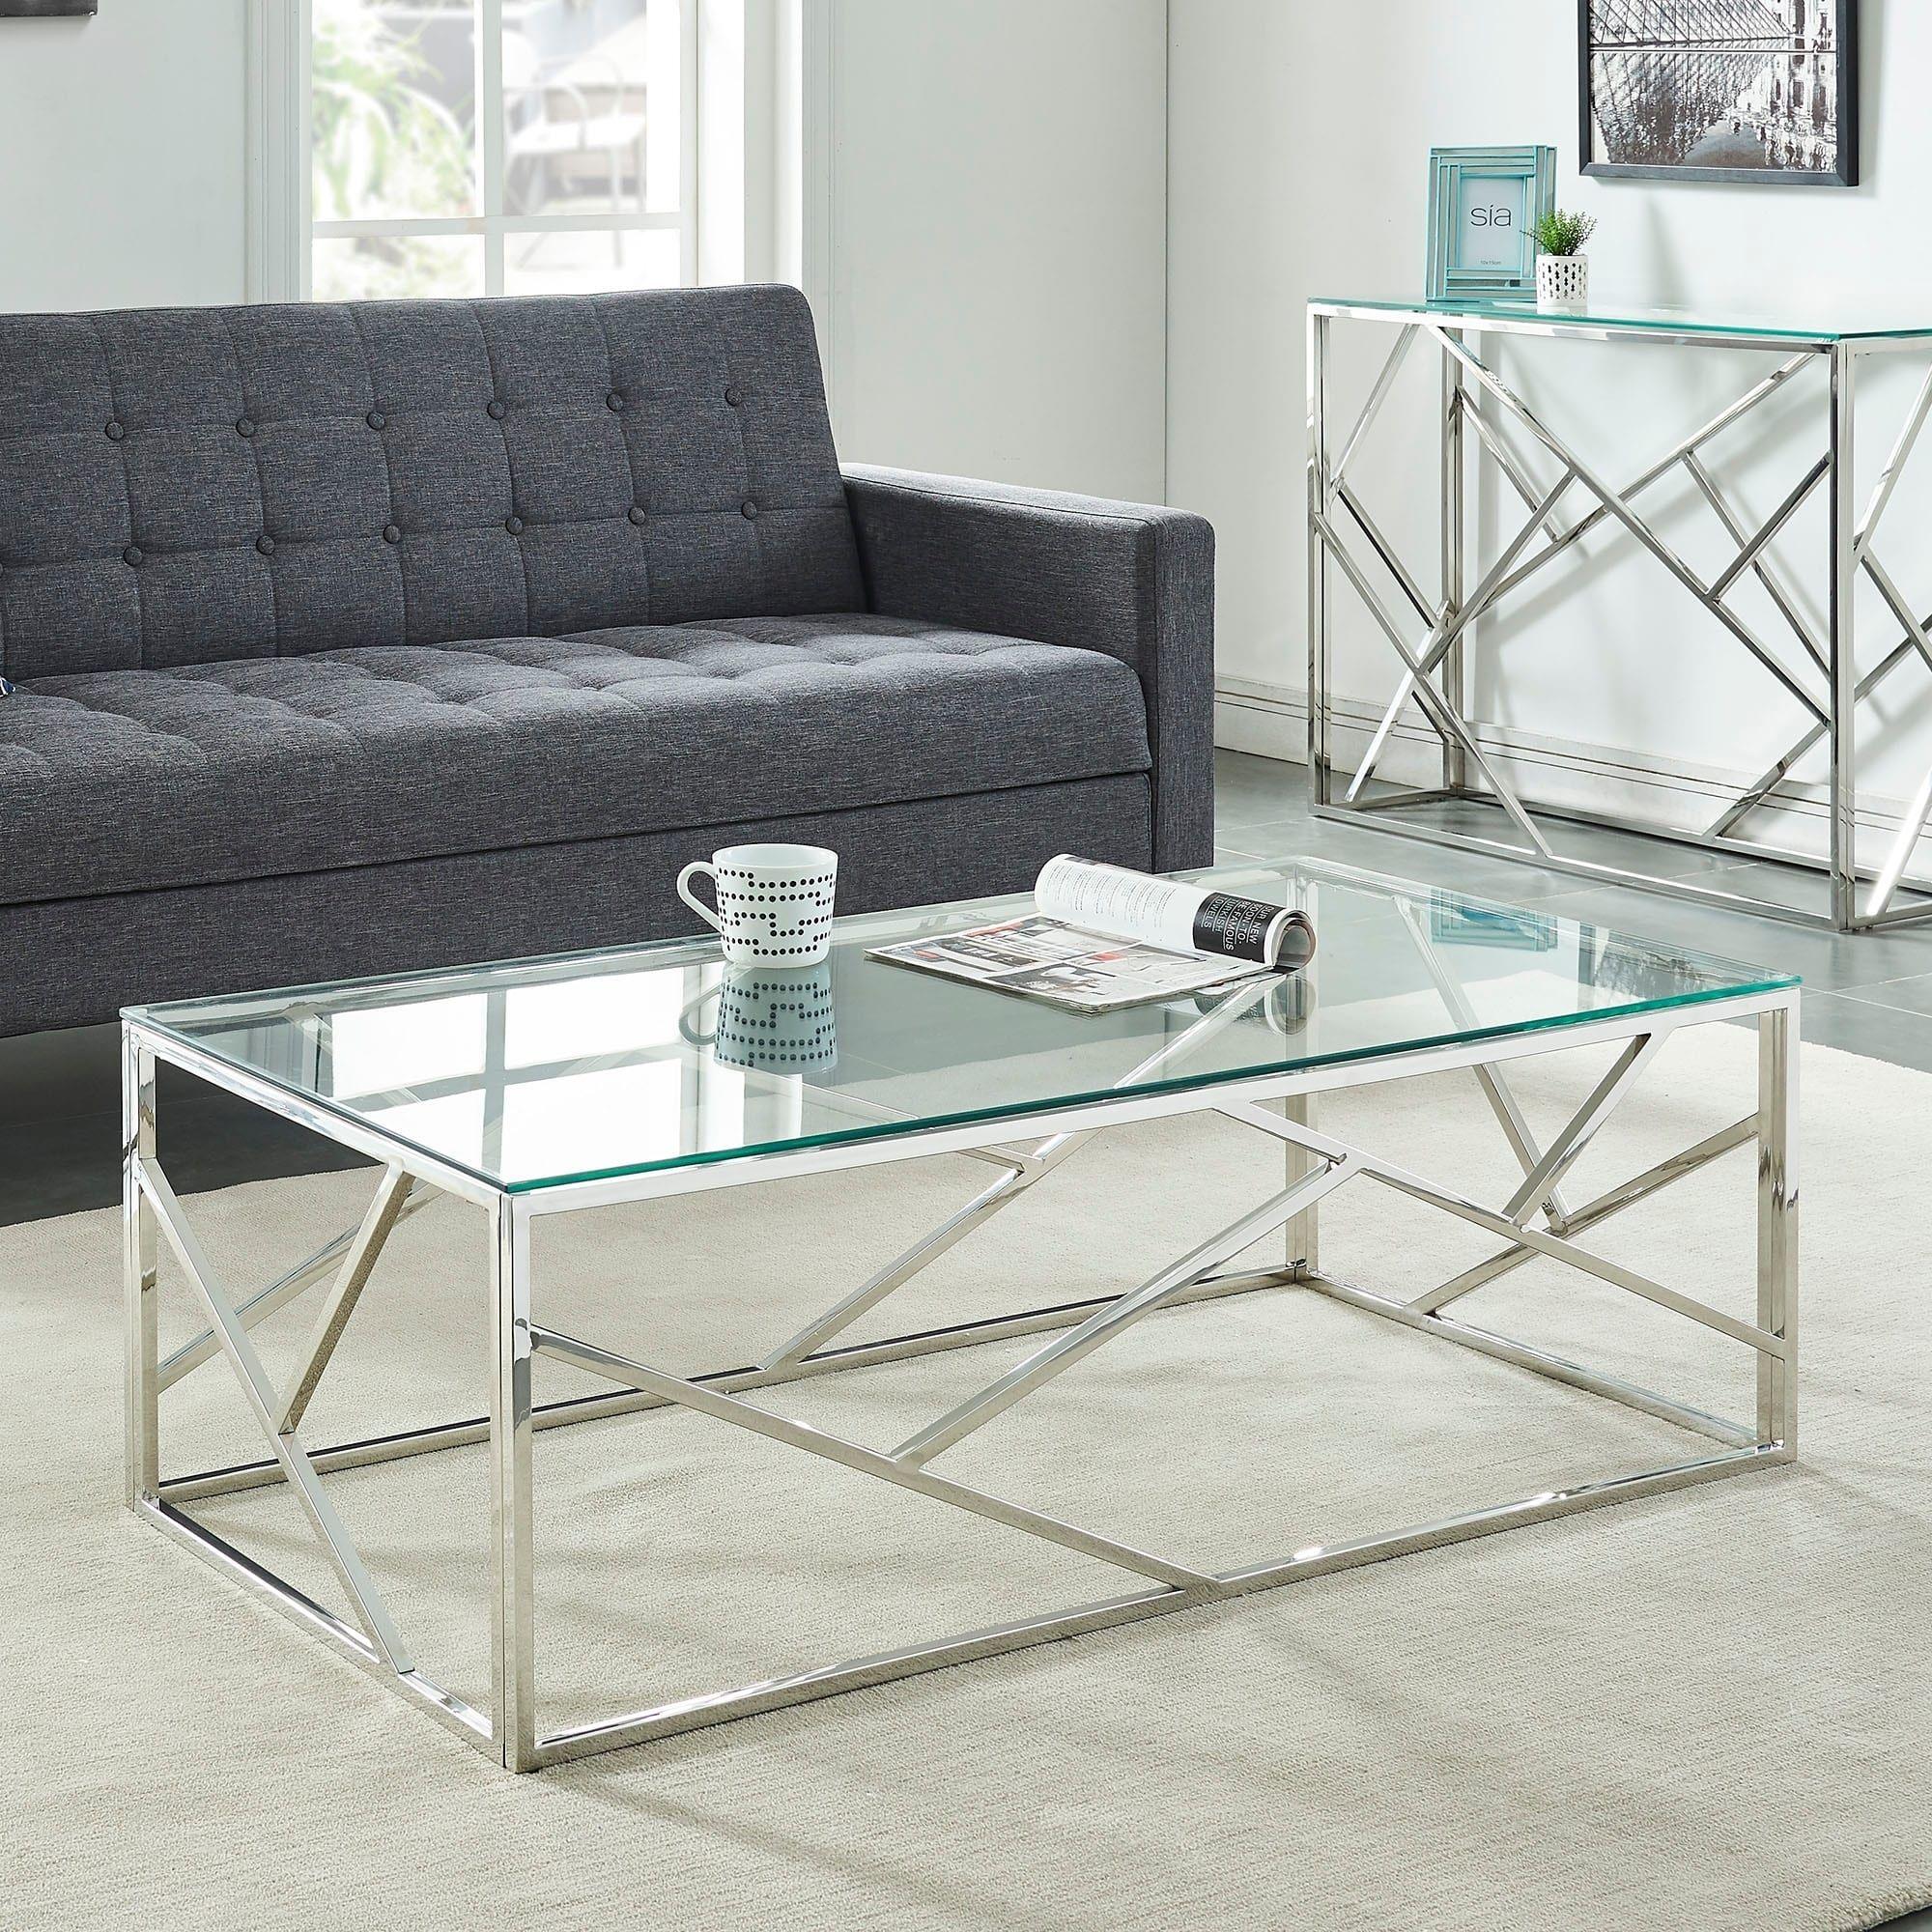 Pin By Brahim Ben Taher On Steel In 2021 Coffee Table Stainless Steel Coffee Table Coffee Table Setting [ 2000 x 2000 Pixel ]